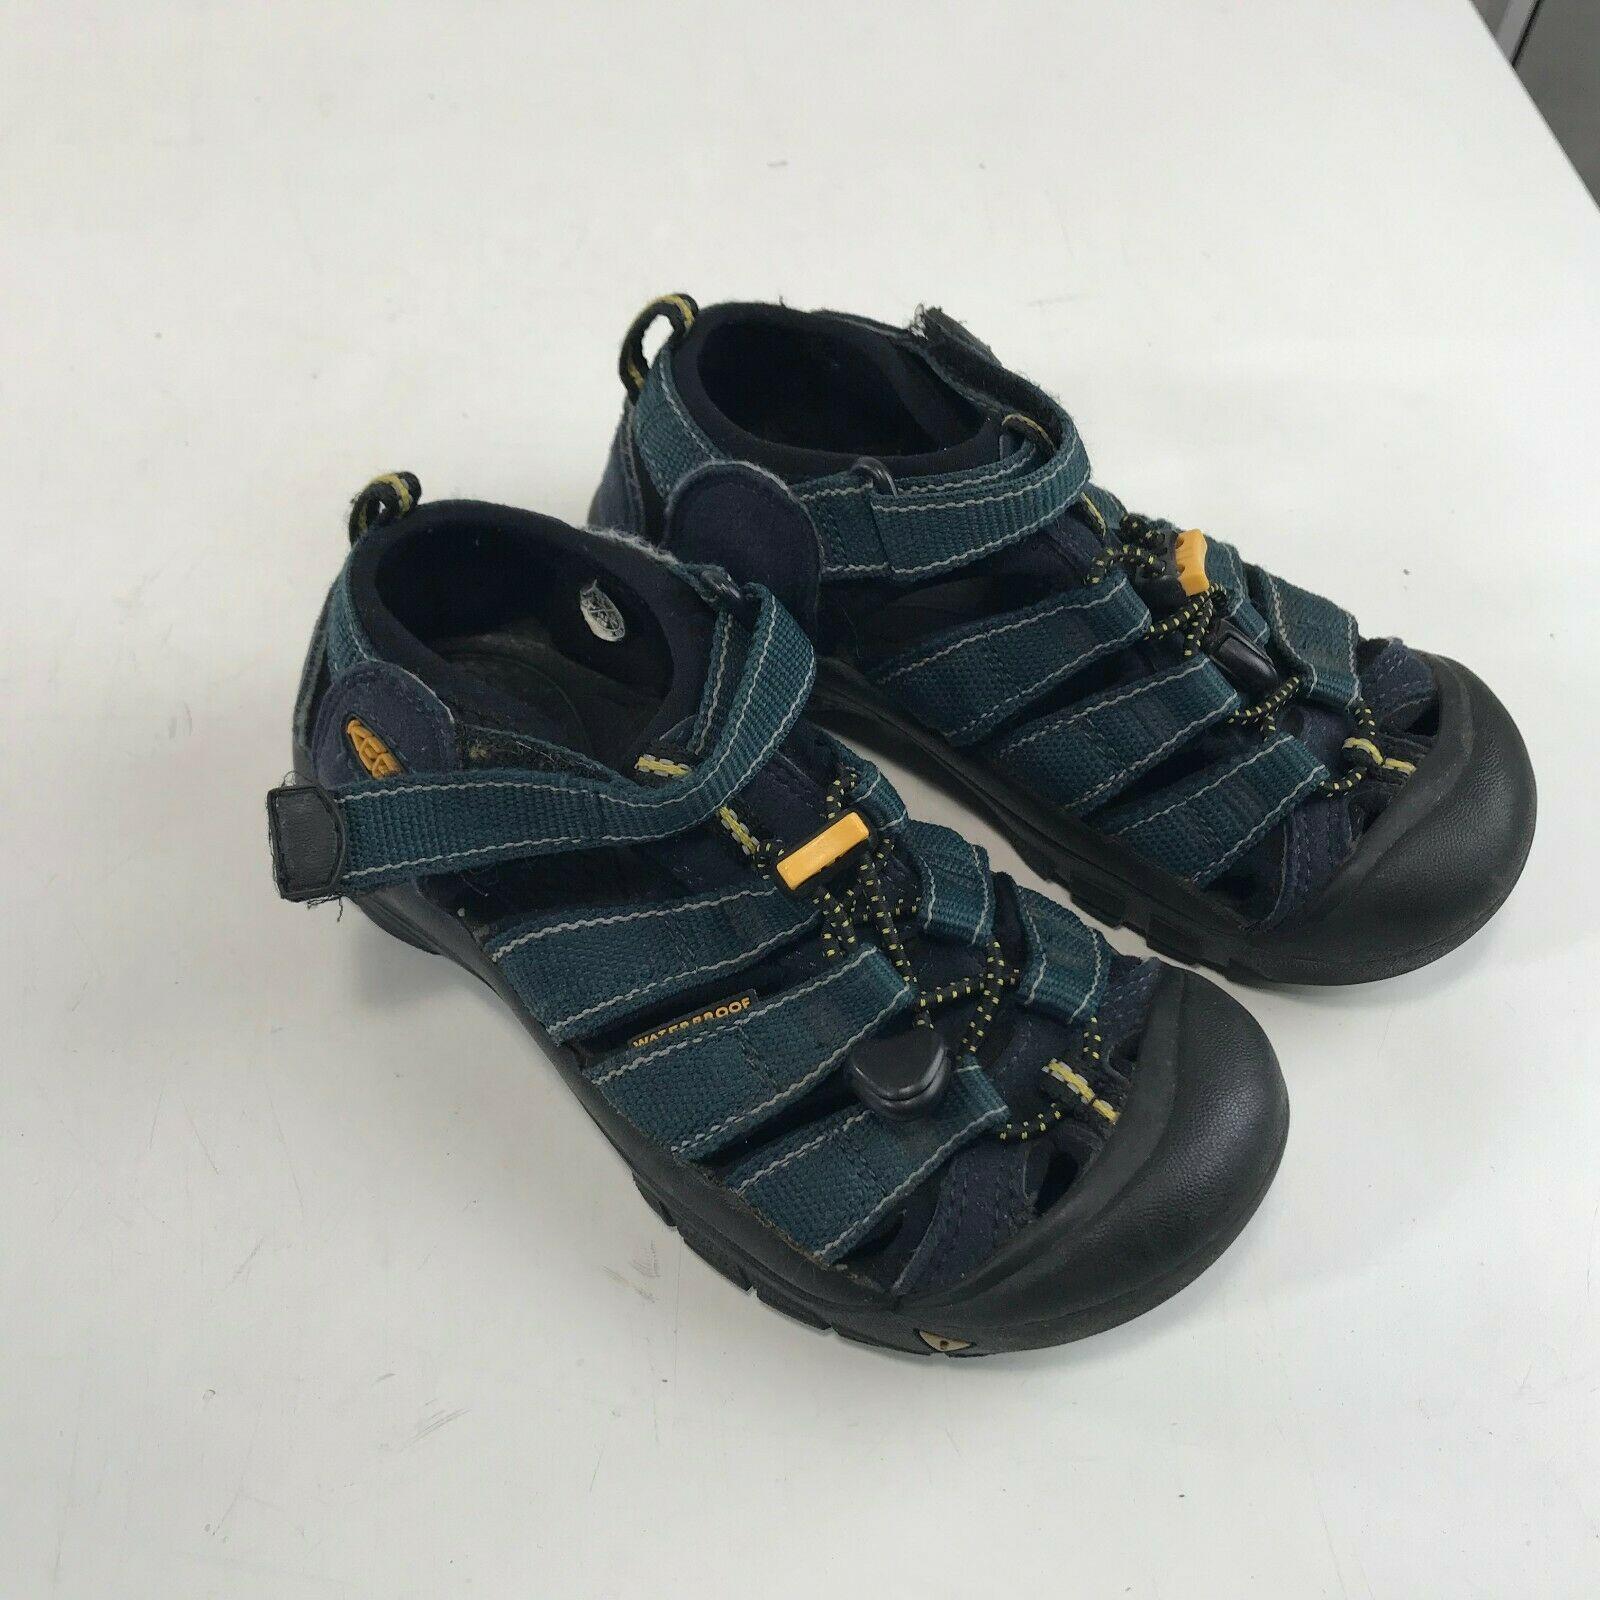 KEEN Newport Waterproof Sports Sandals Shoes Size 13 Boy Toddler image 2